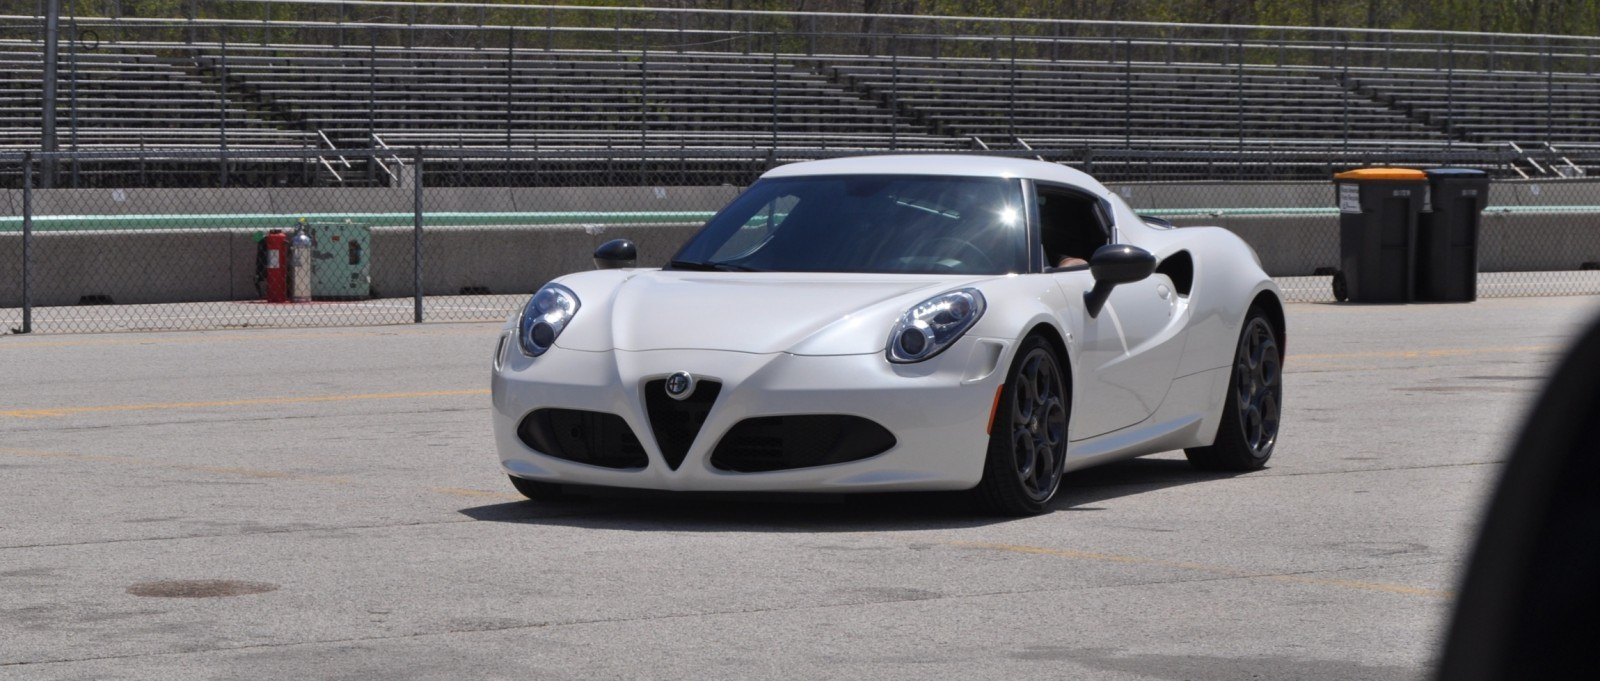 Gorgeous 2015 Alfa-Romeo 4C Revealed in Full USA Trim + New Headlights! 1